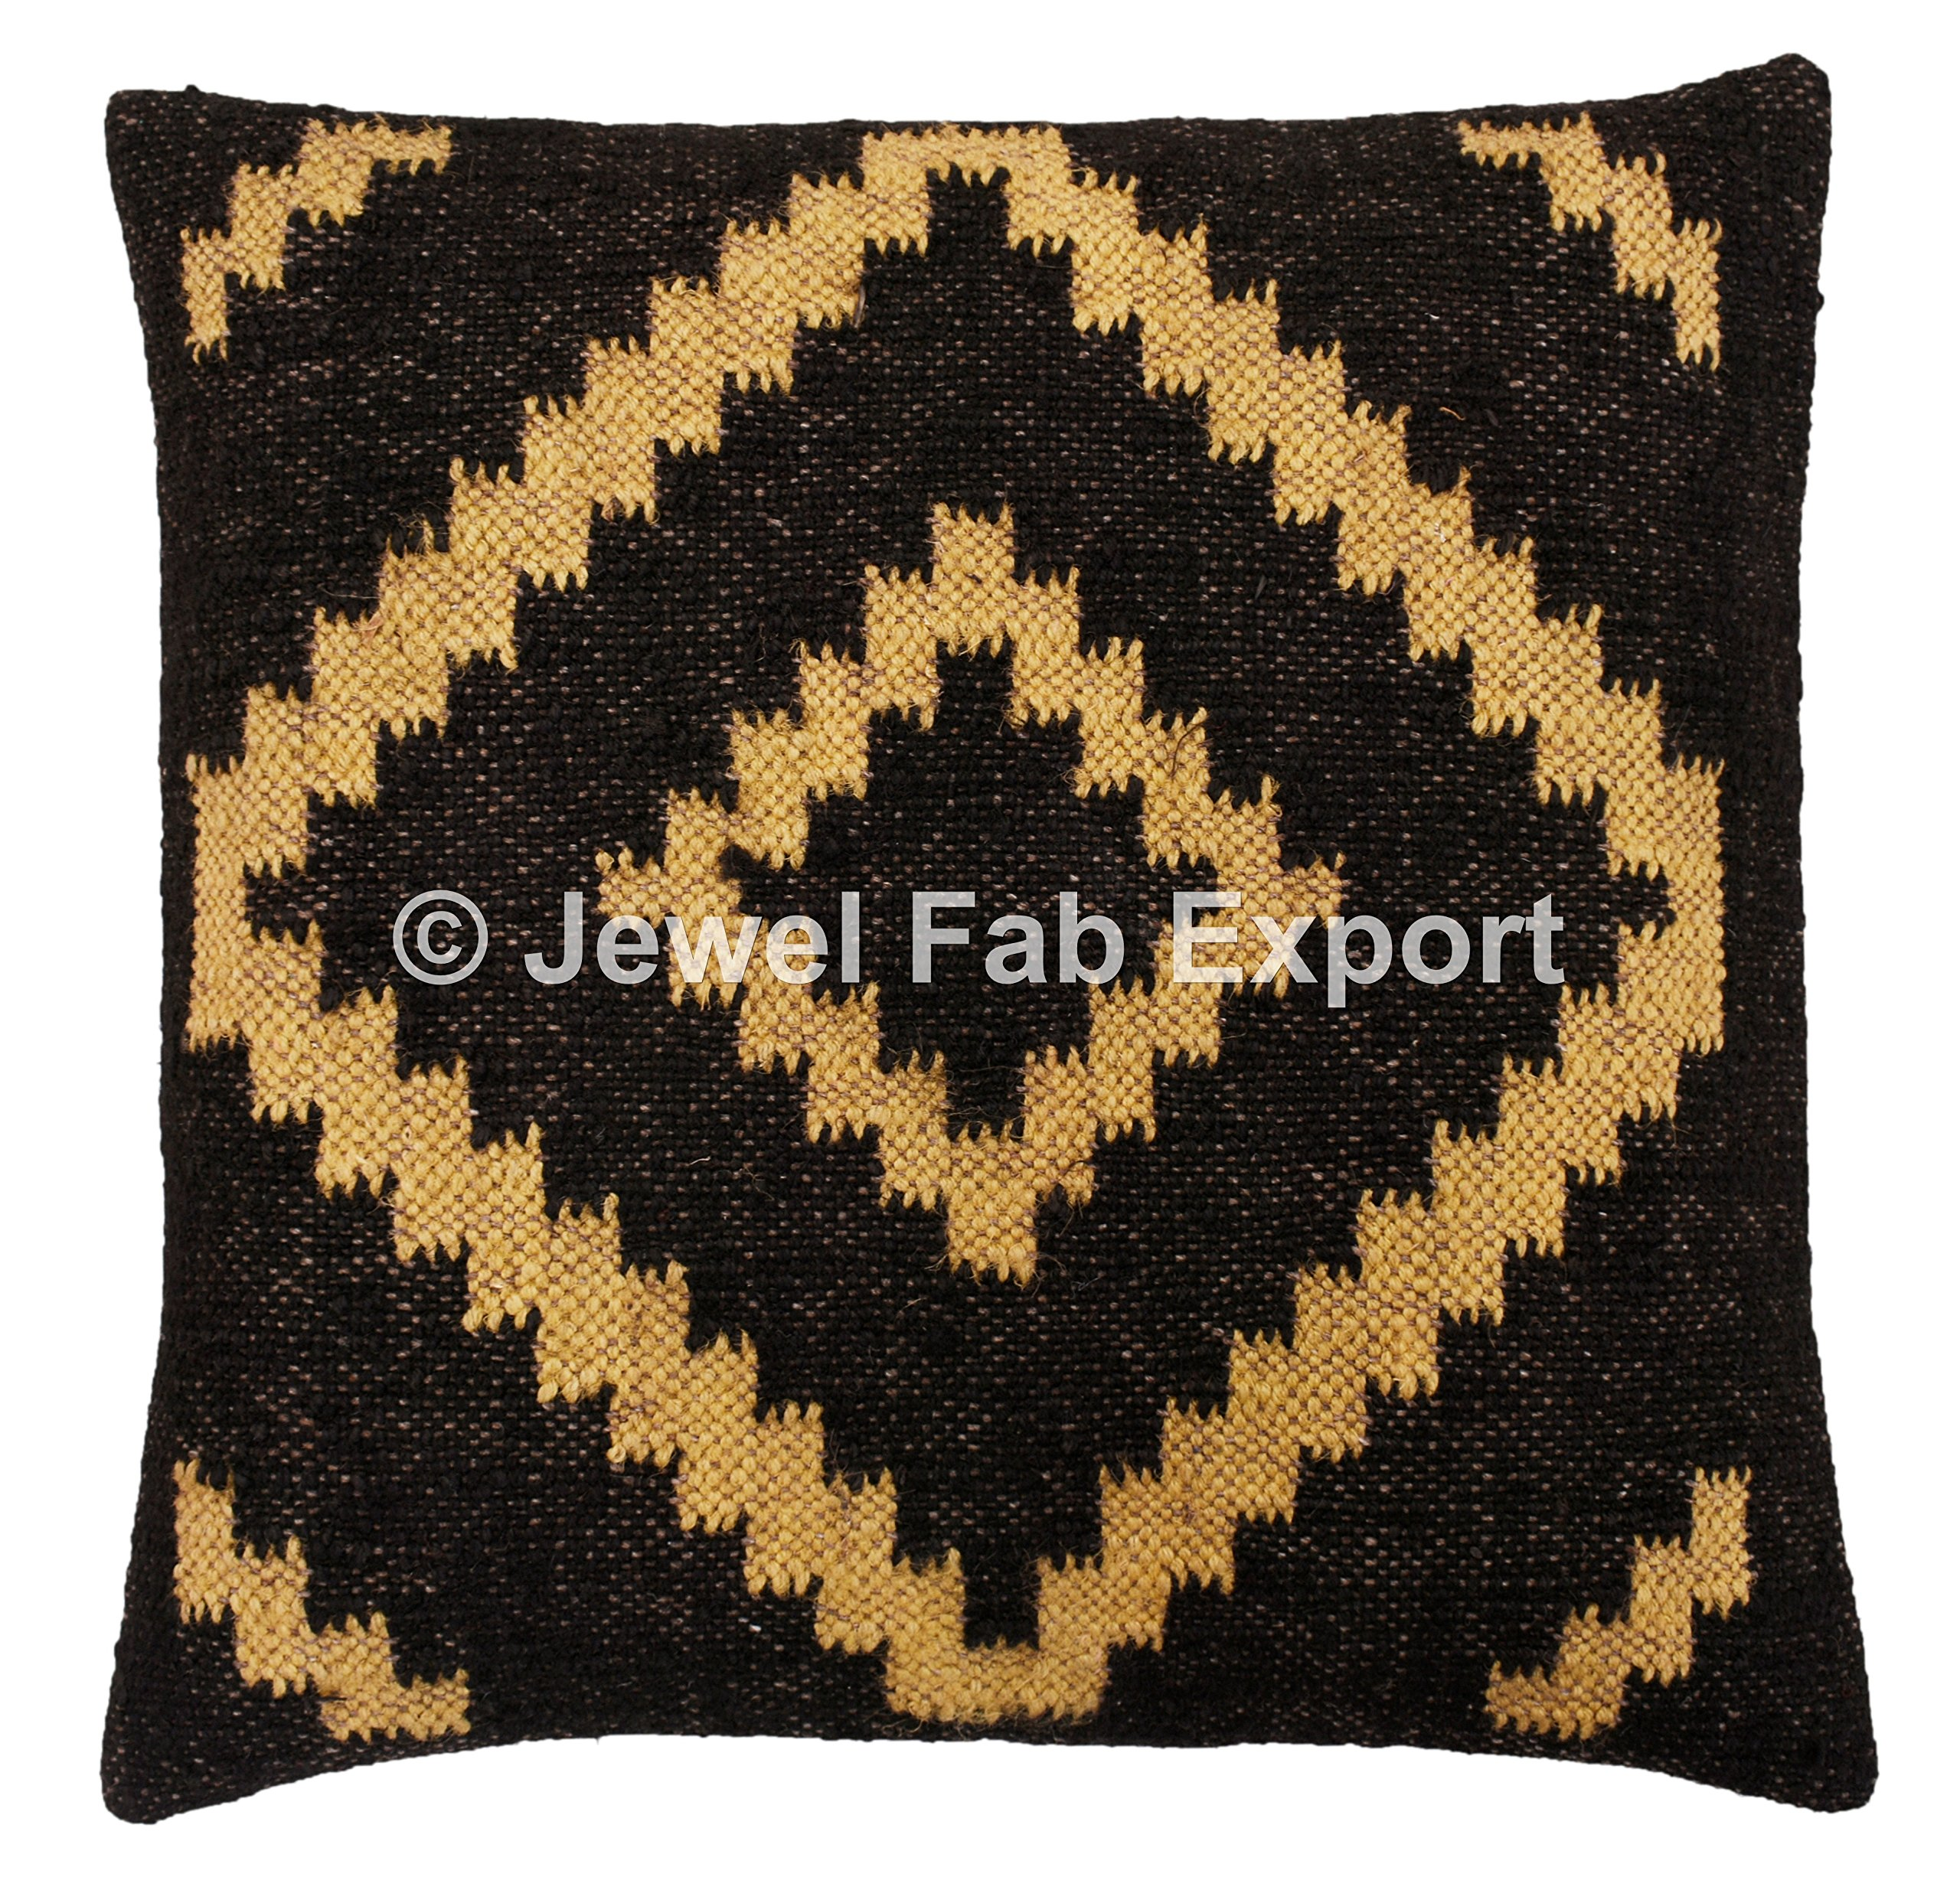 Set Of 5 Indian Vintage 18 x 18'' Living Room Decorative Jute Rug Cushion Cover, Handmade Kilim Pillow Sham For Sofa -Floor-Pillow Throw Bohemian Pillow Cases